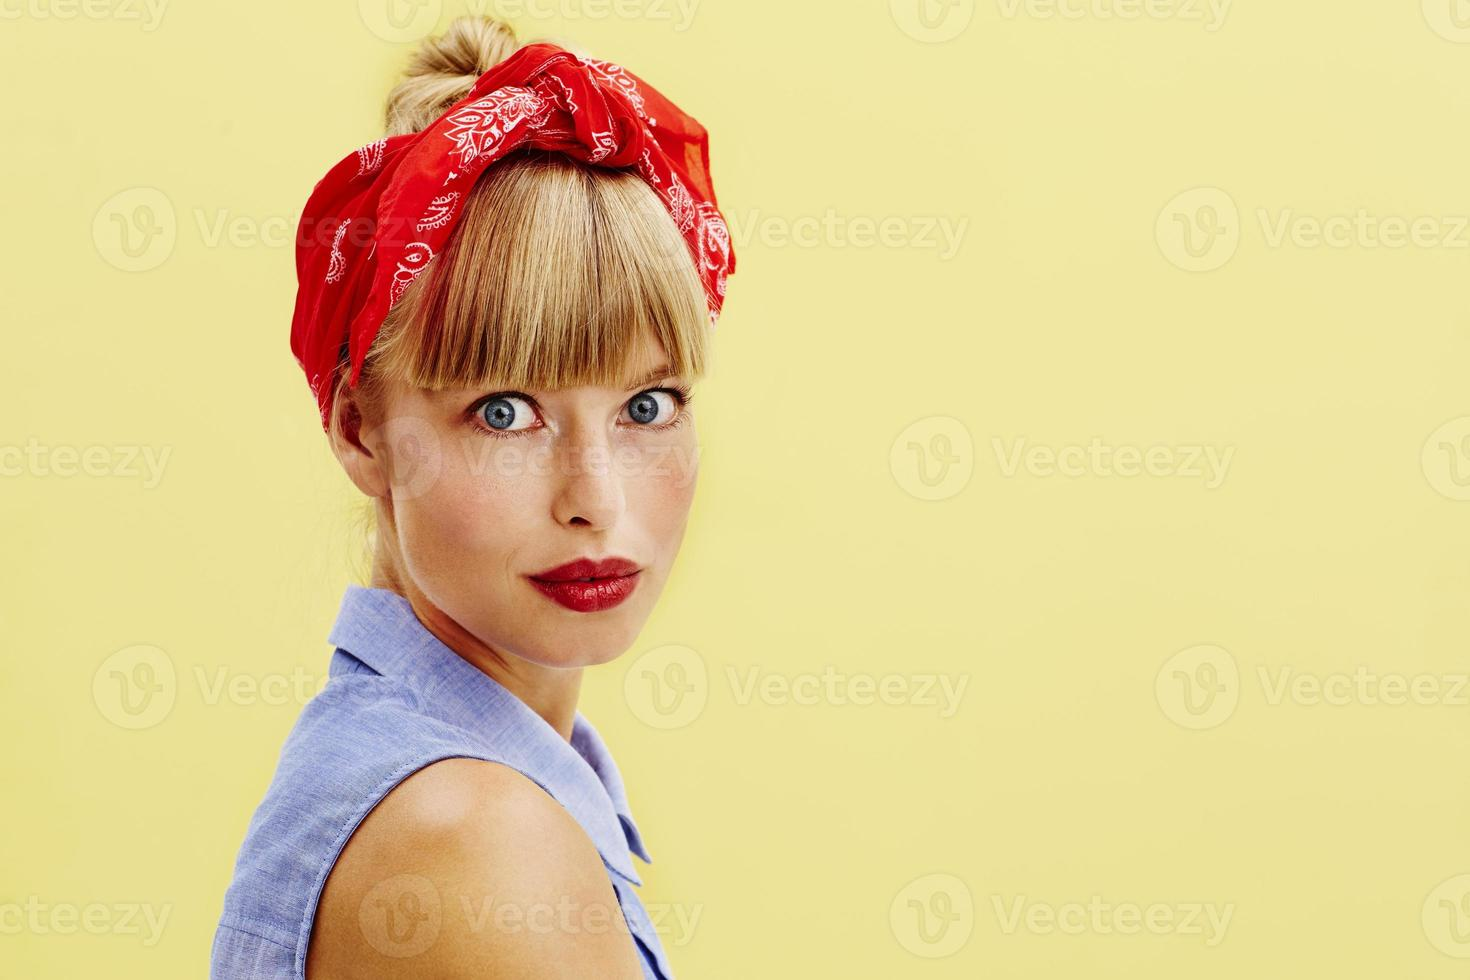 mooie jonge vrouw in retro kleding foto